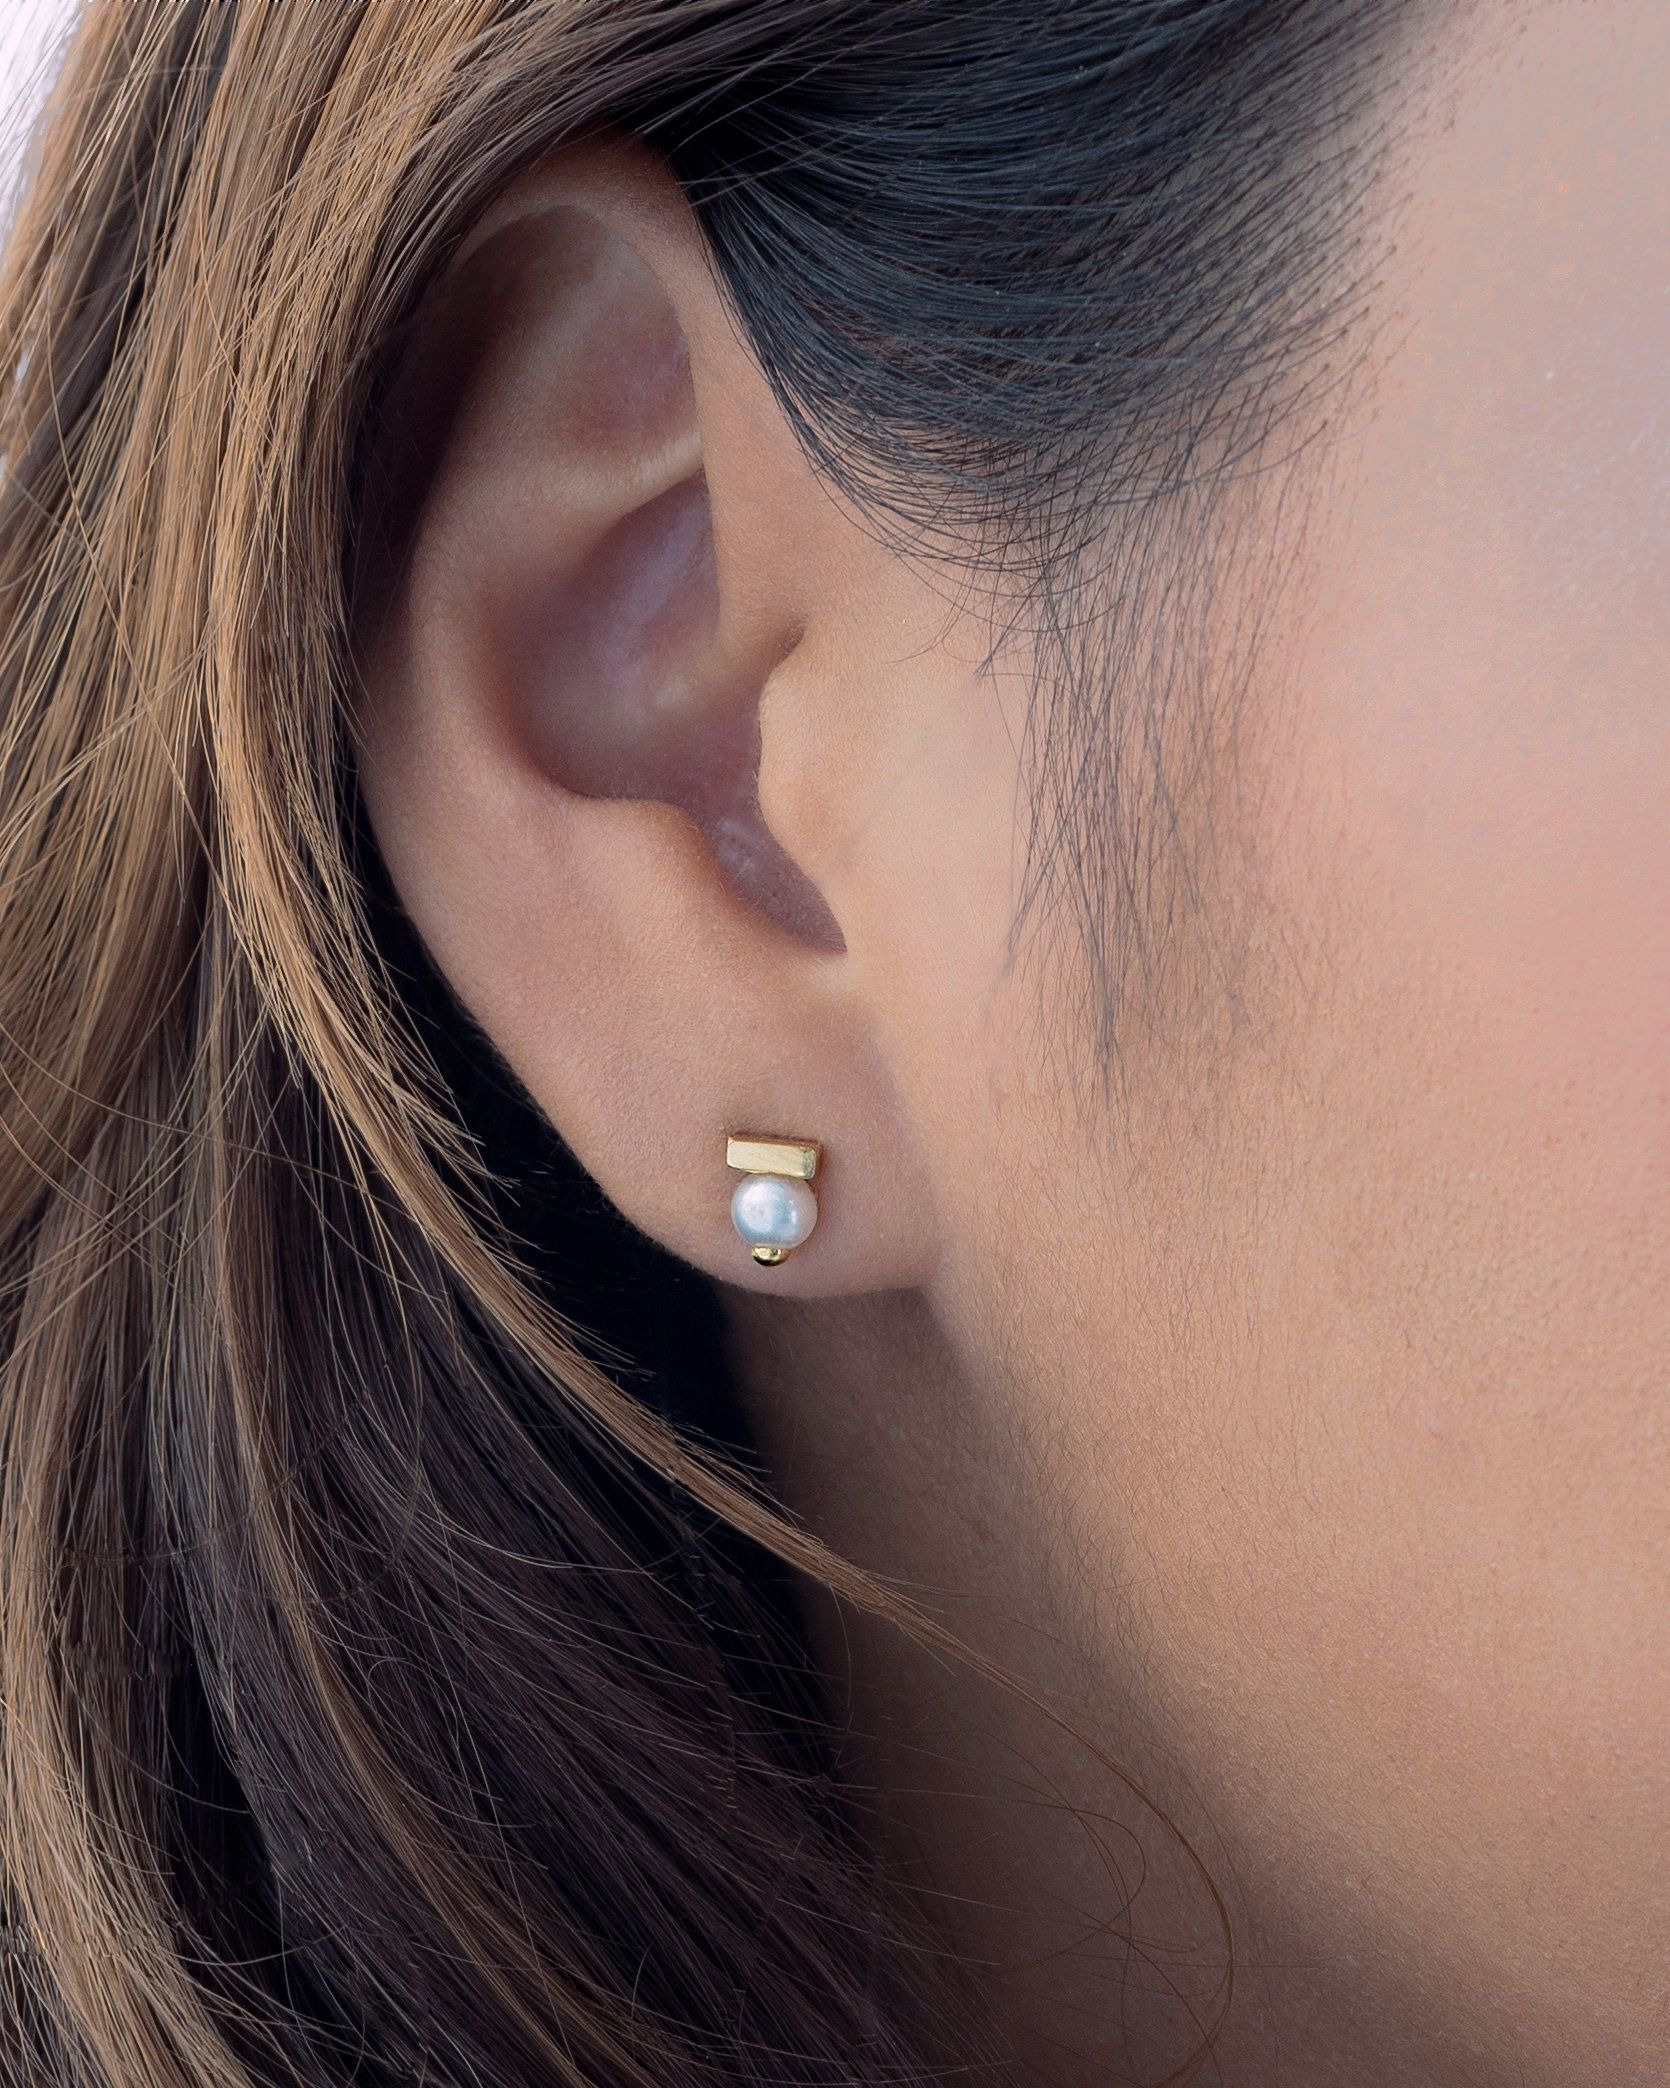 Anniversary Gifts Women/'s Earrings Minimalist Pearls Earrings Gold Pearl Stud Natural Pearl Earrings Dainty Freshwater Pearls Earrings